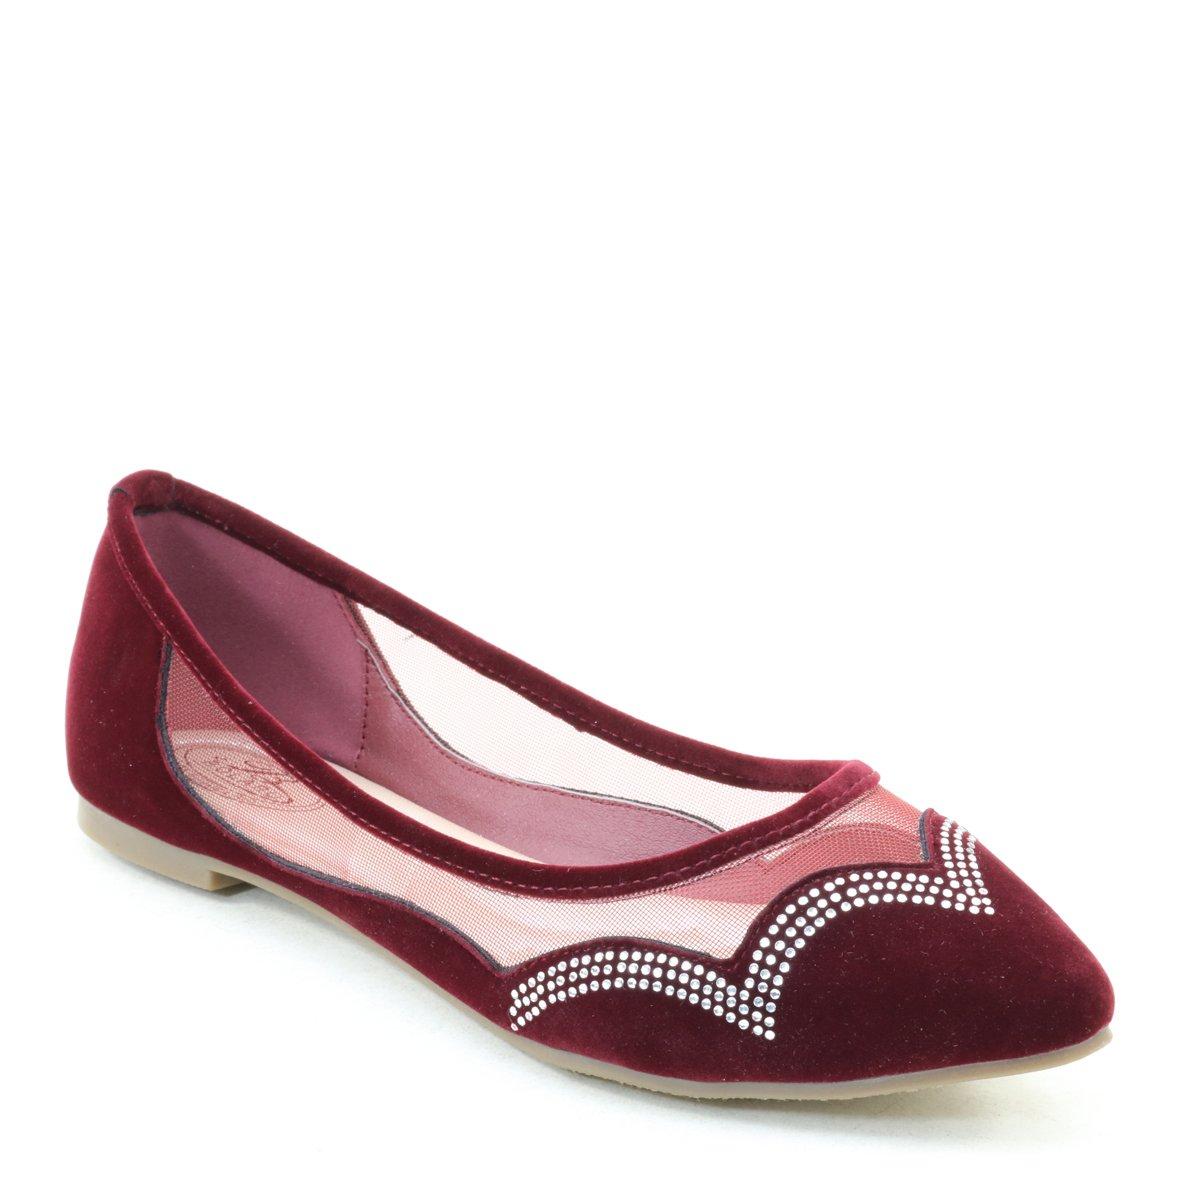 New Brieten Women's Rhinestone Mesh Pointed Toe Flats Comfortable Shoes B06XCQT9JK 8 B(M) US|Wine